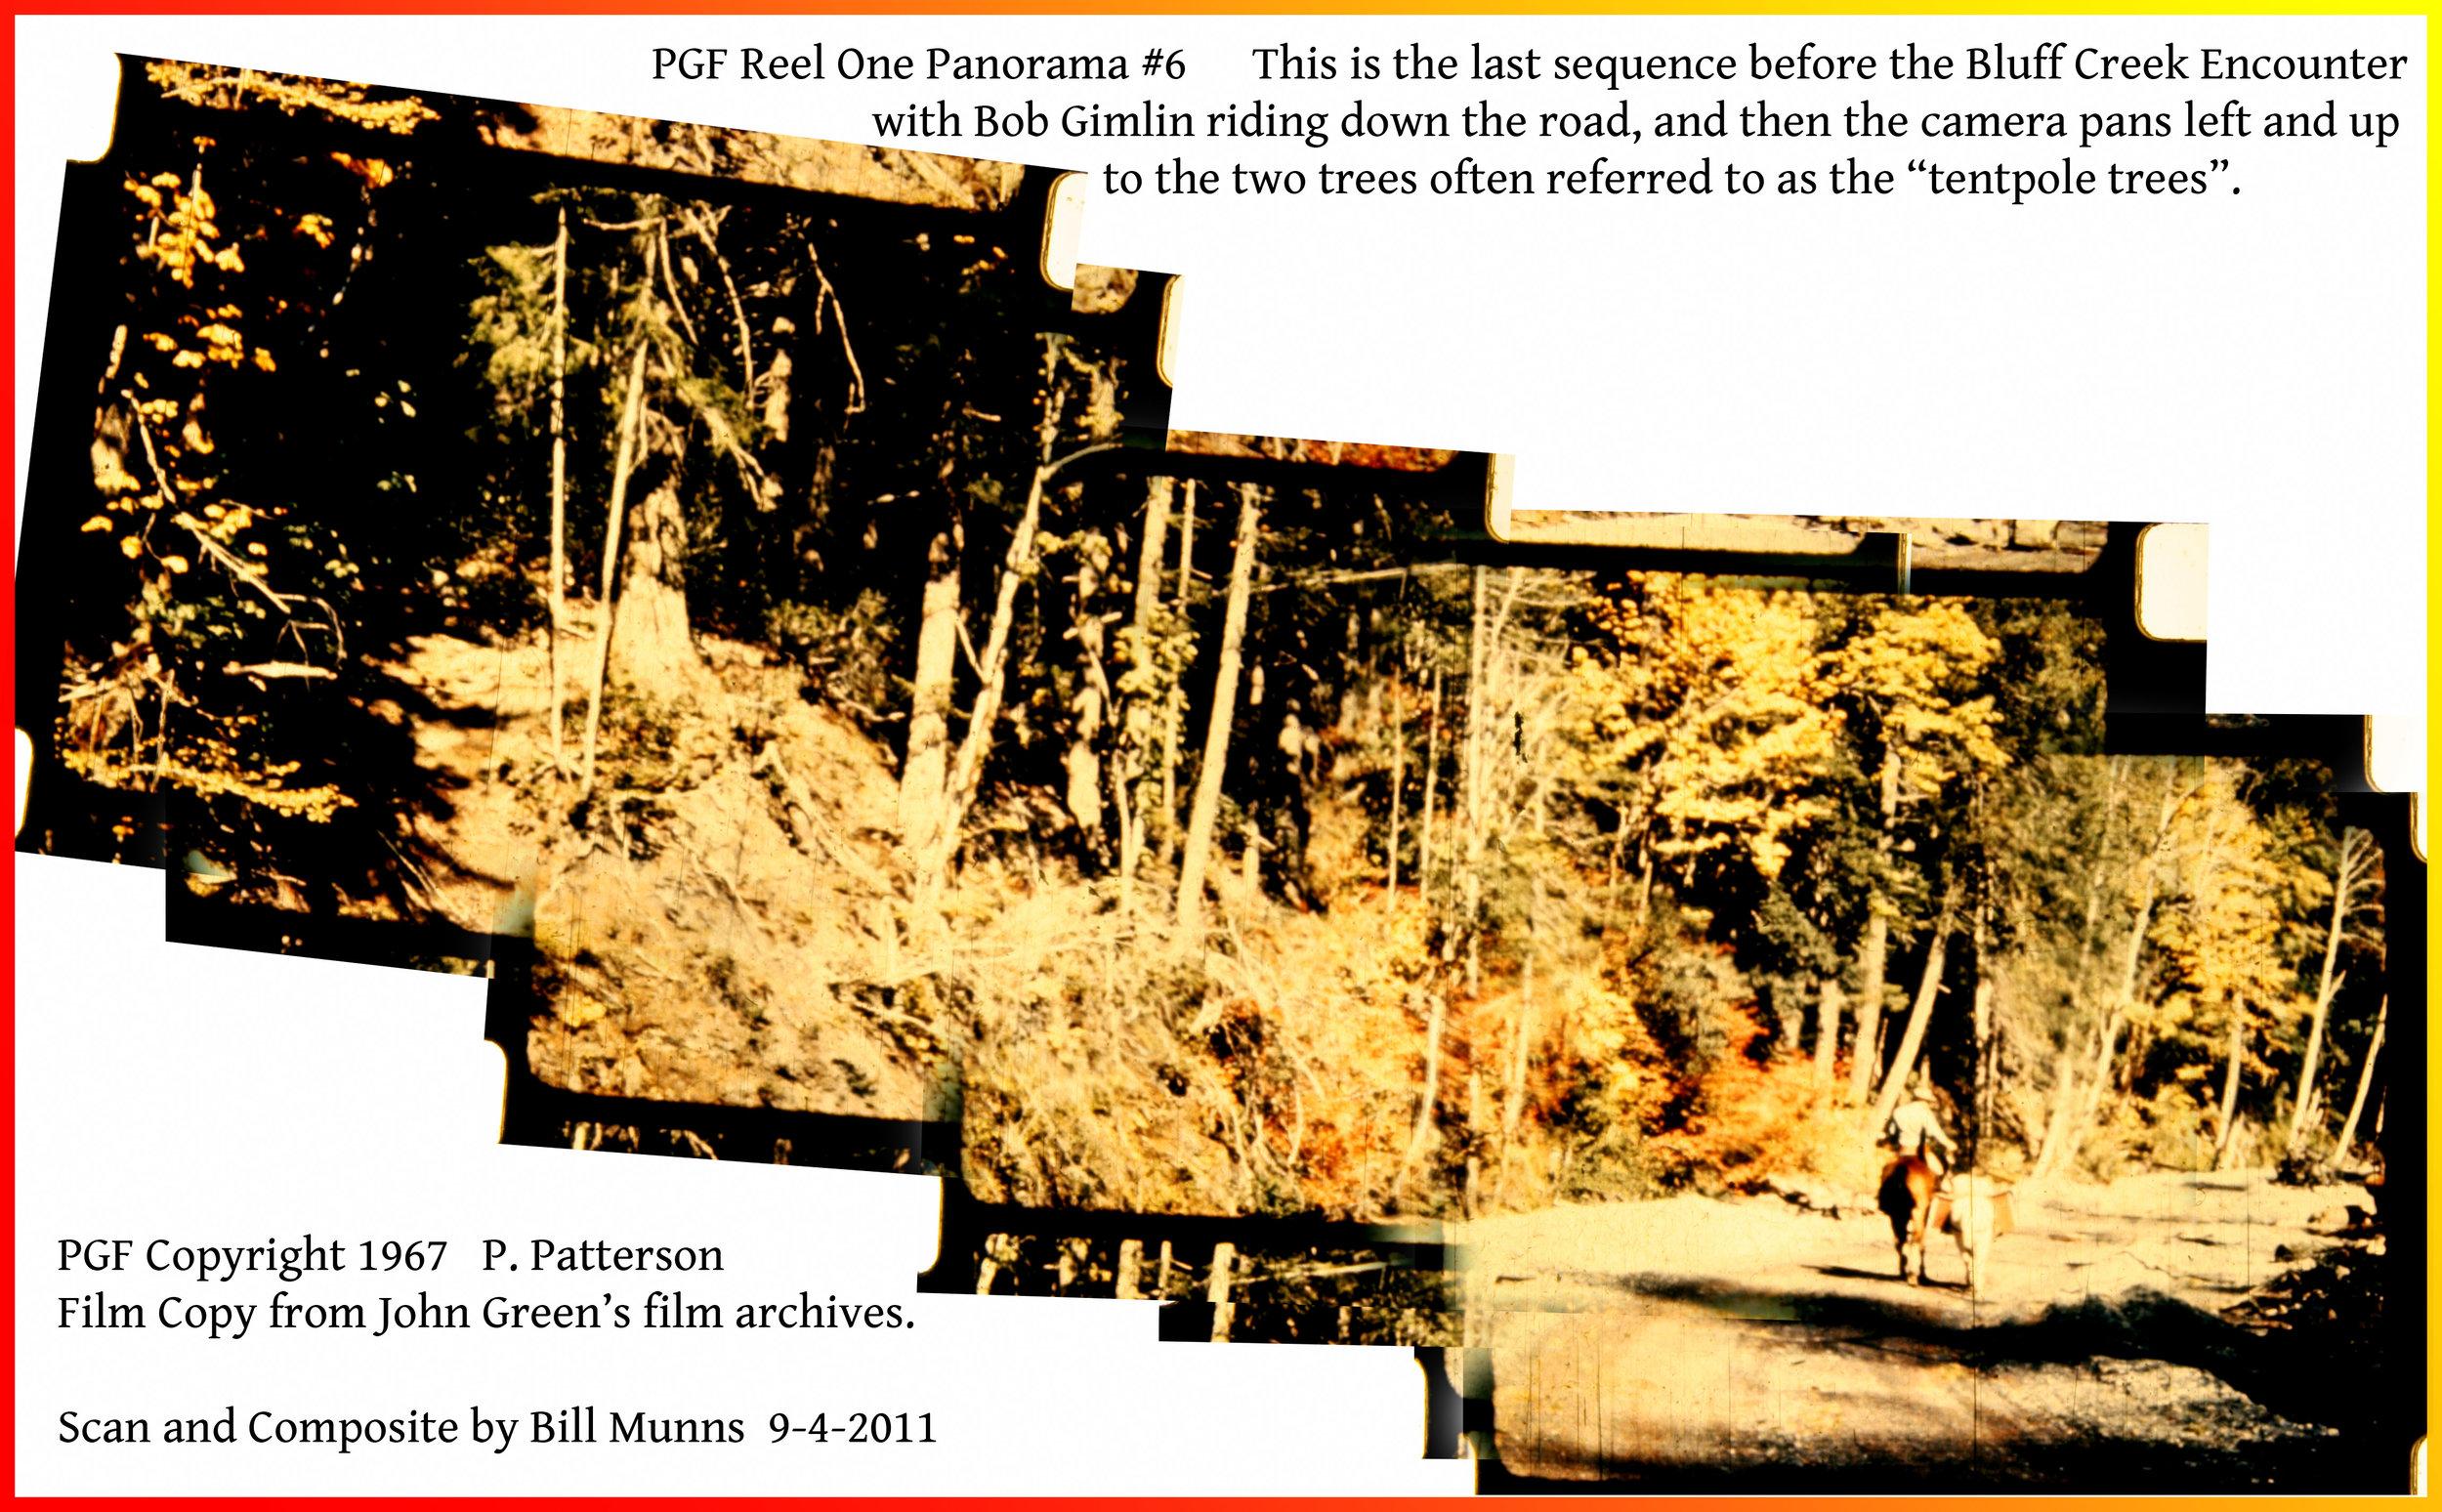 PGF Reel One Panorama #6